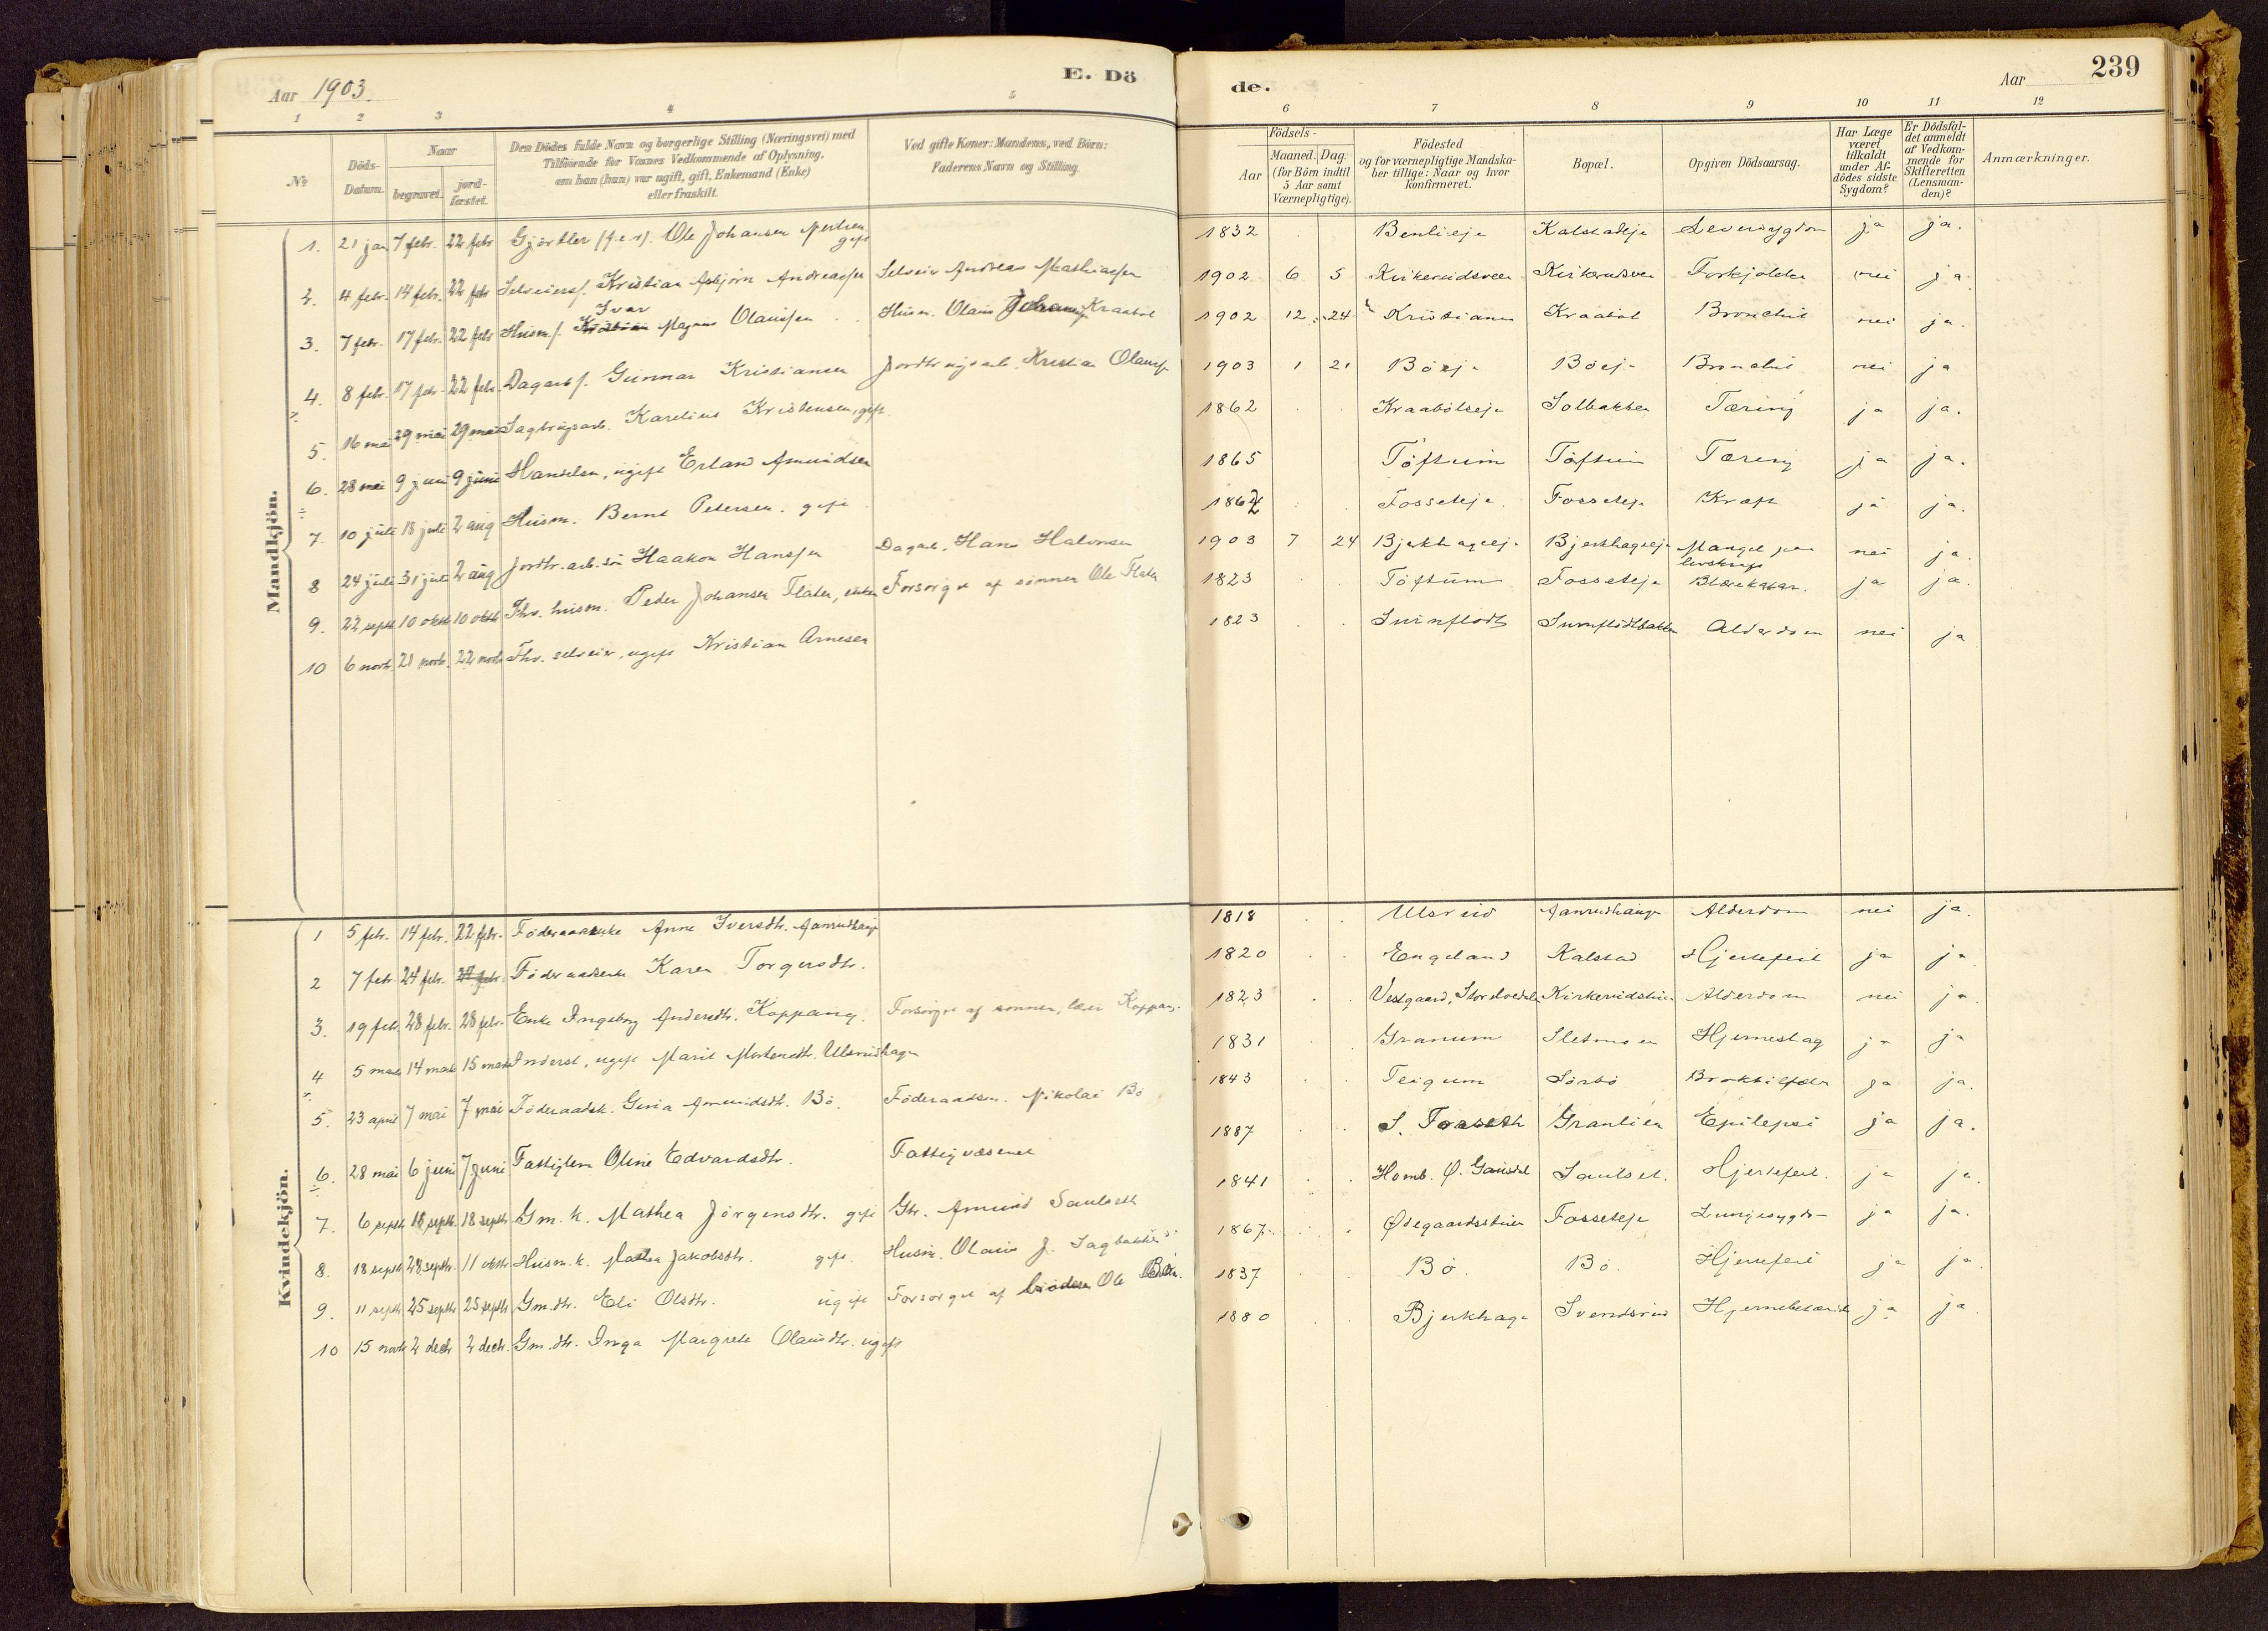 SAH, Vestre Gausdal prestekontor, Ministerialbok nr. 1, 1887-1914, s. 239